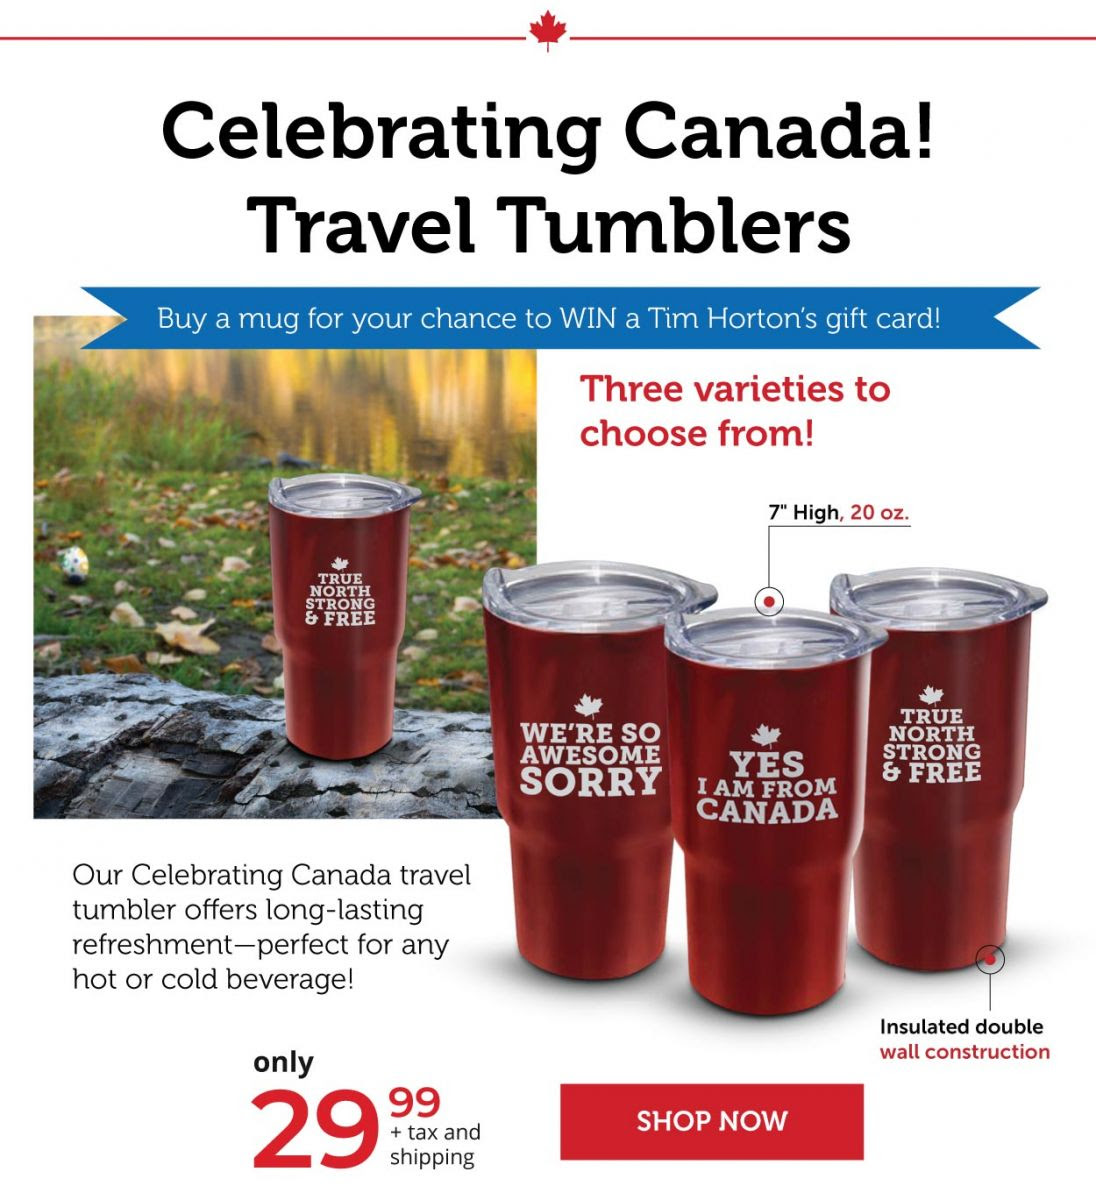 Travel Tumblers